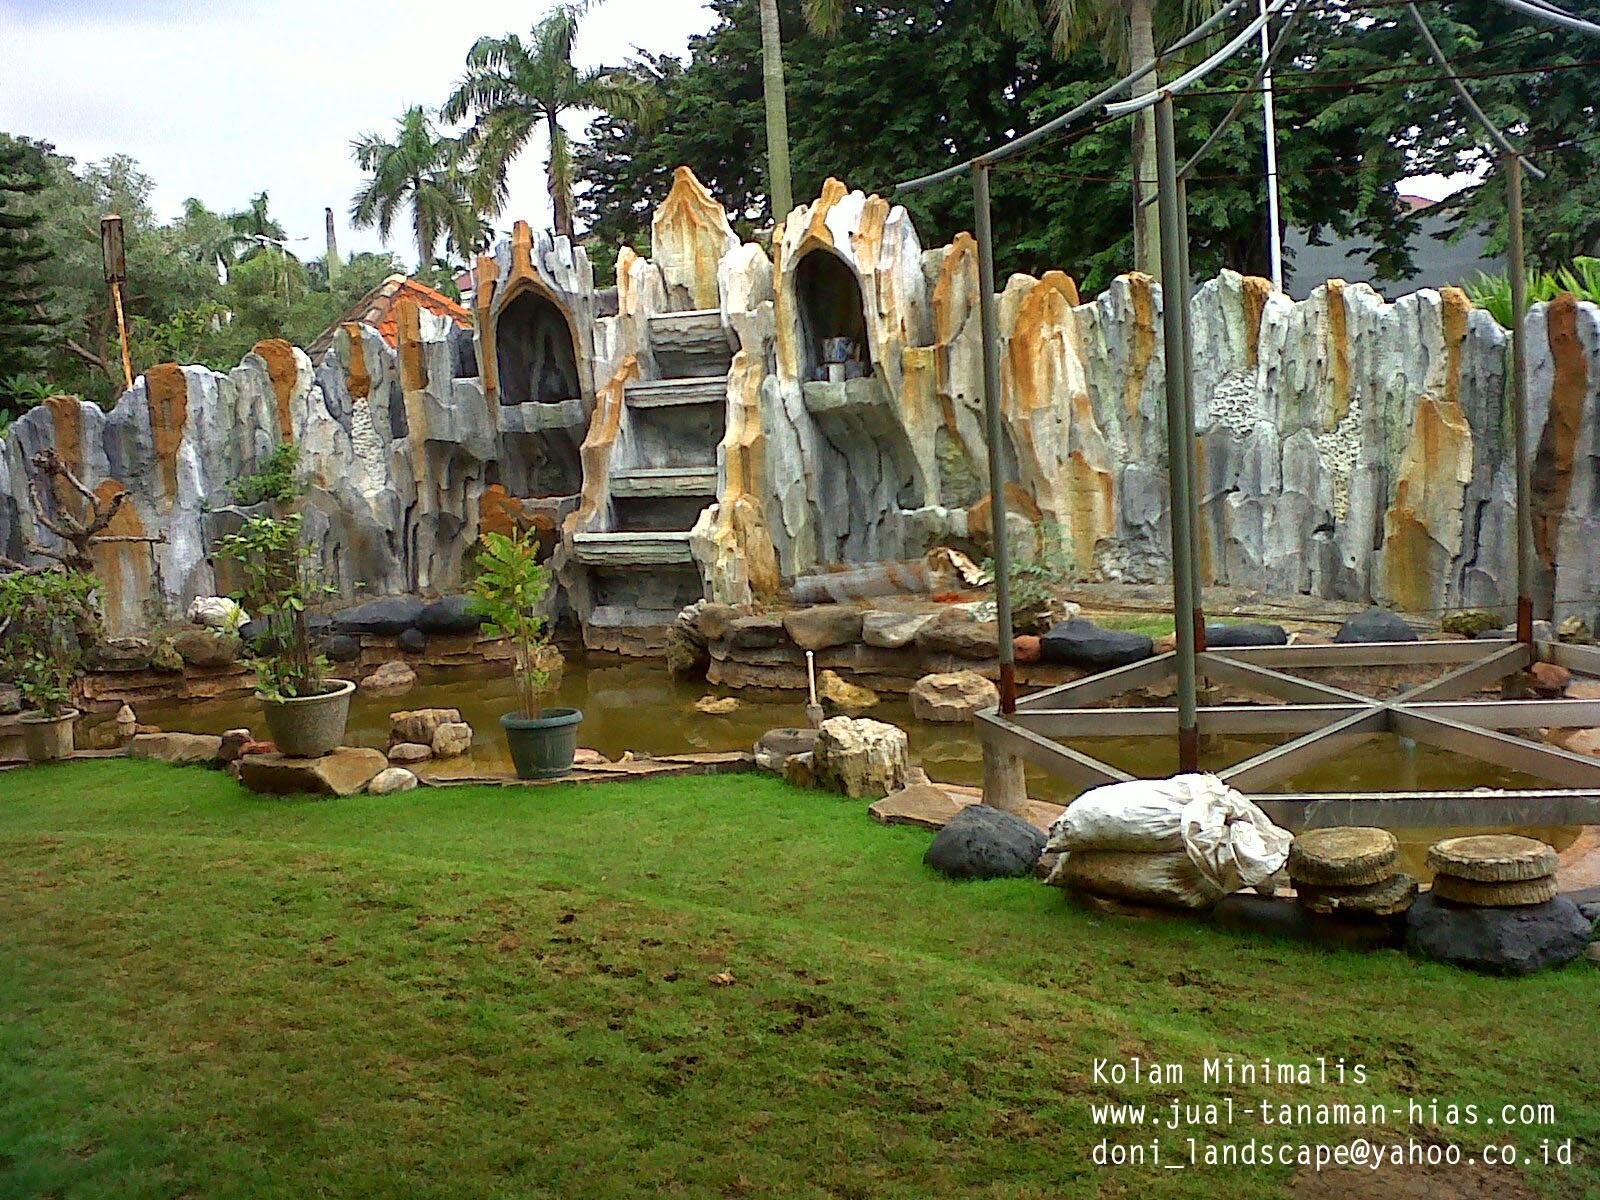 Jasa Tukang Taman Professional Ahli Desain Landscaping Tukang